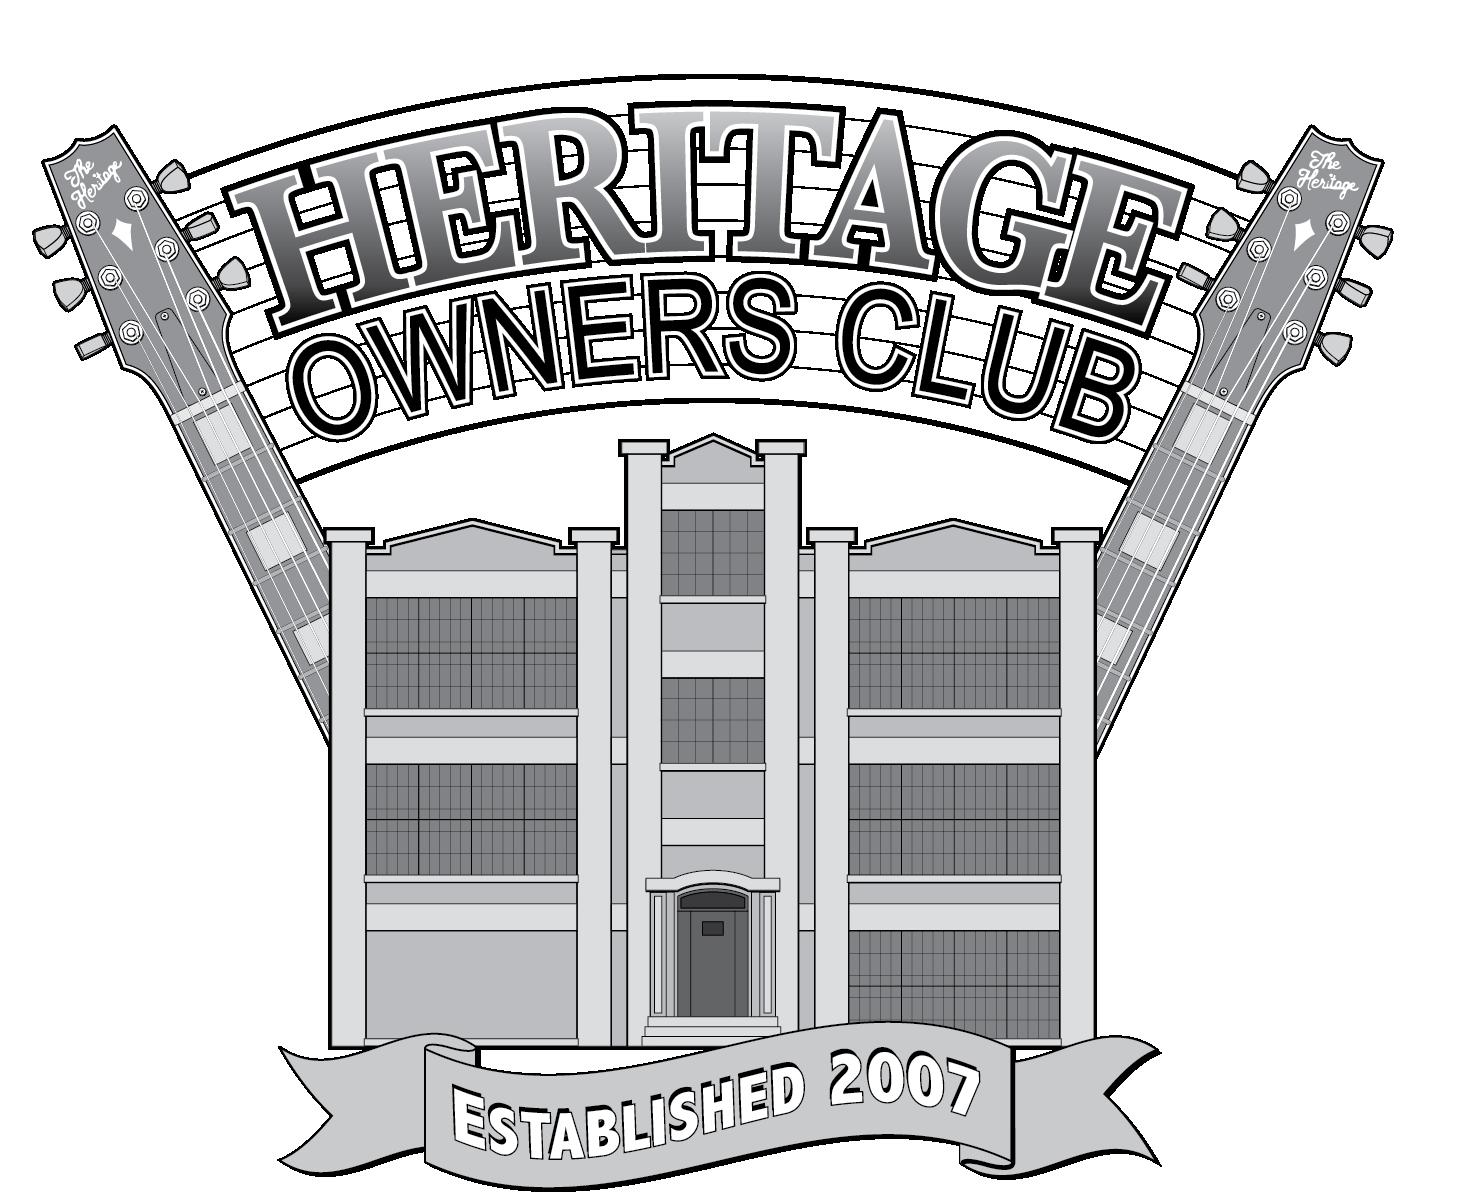 2014 HERITAGE H555